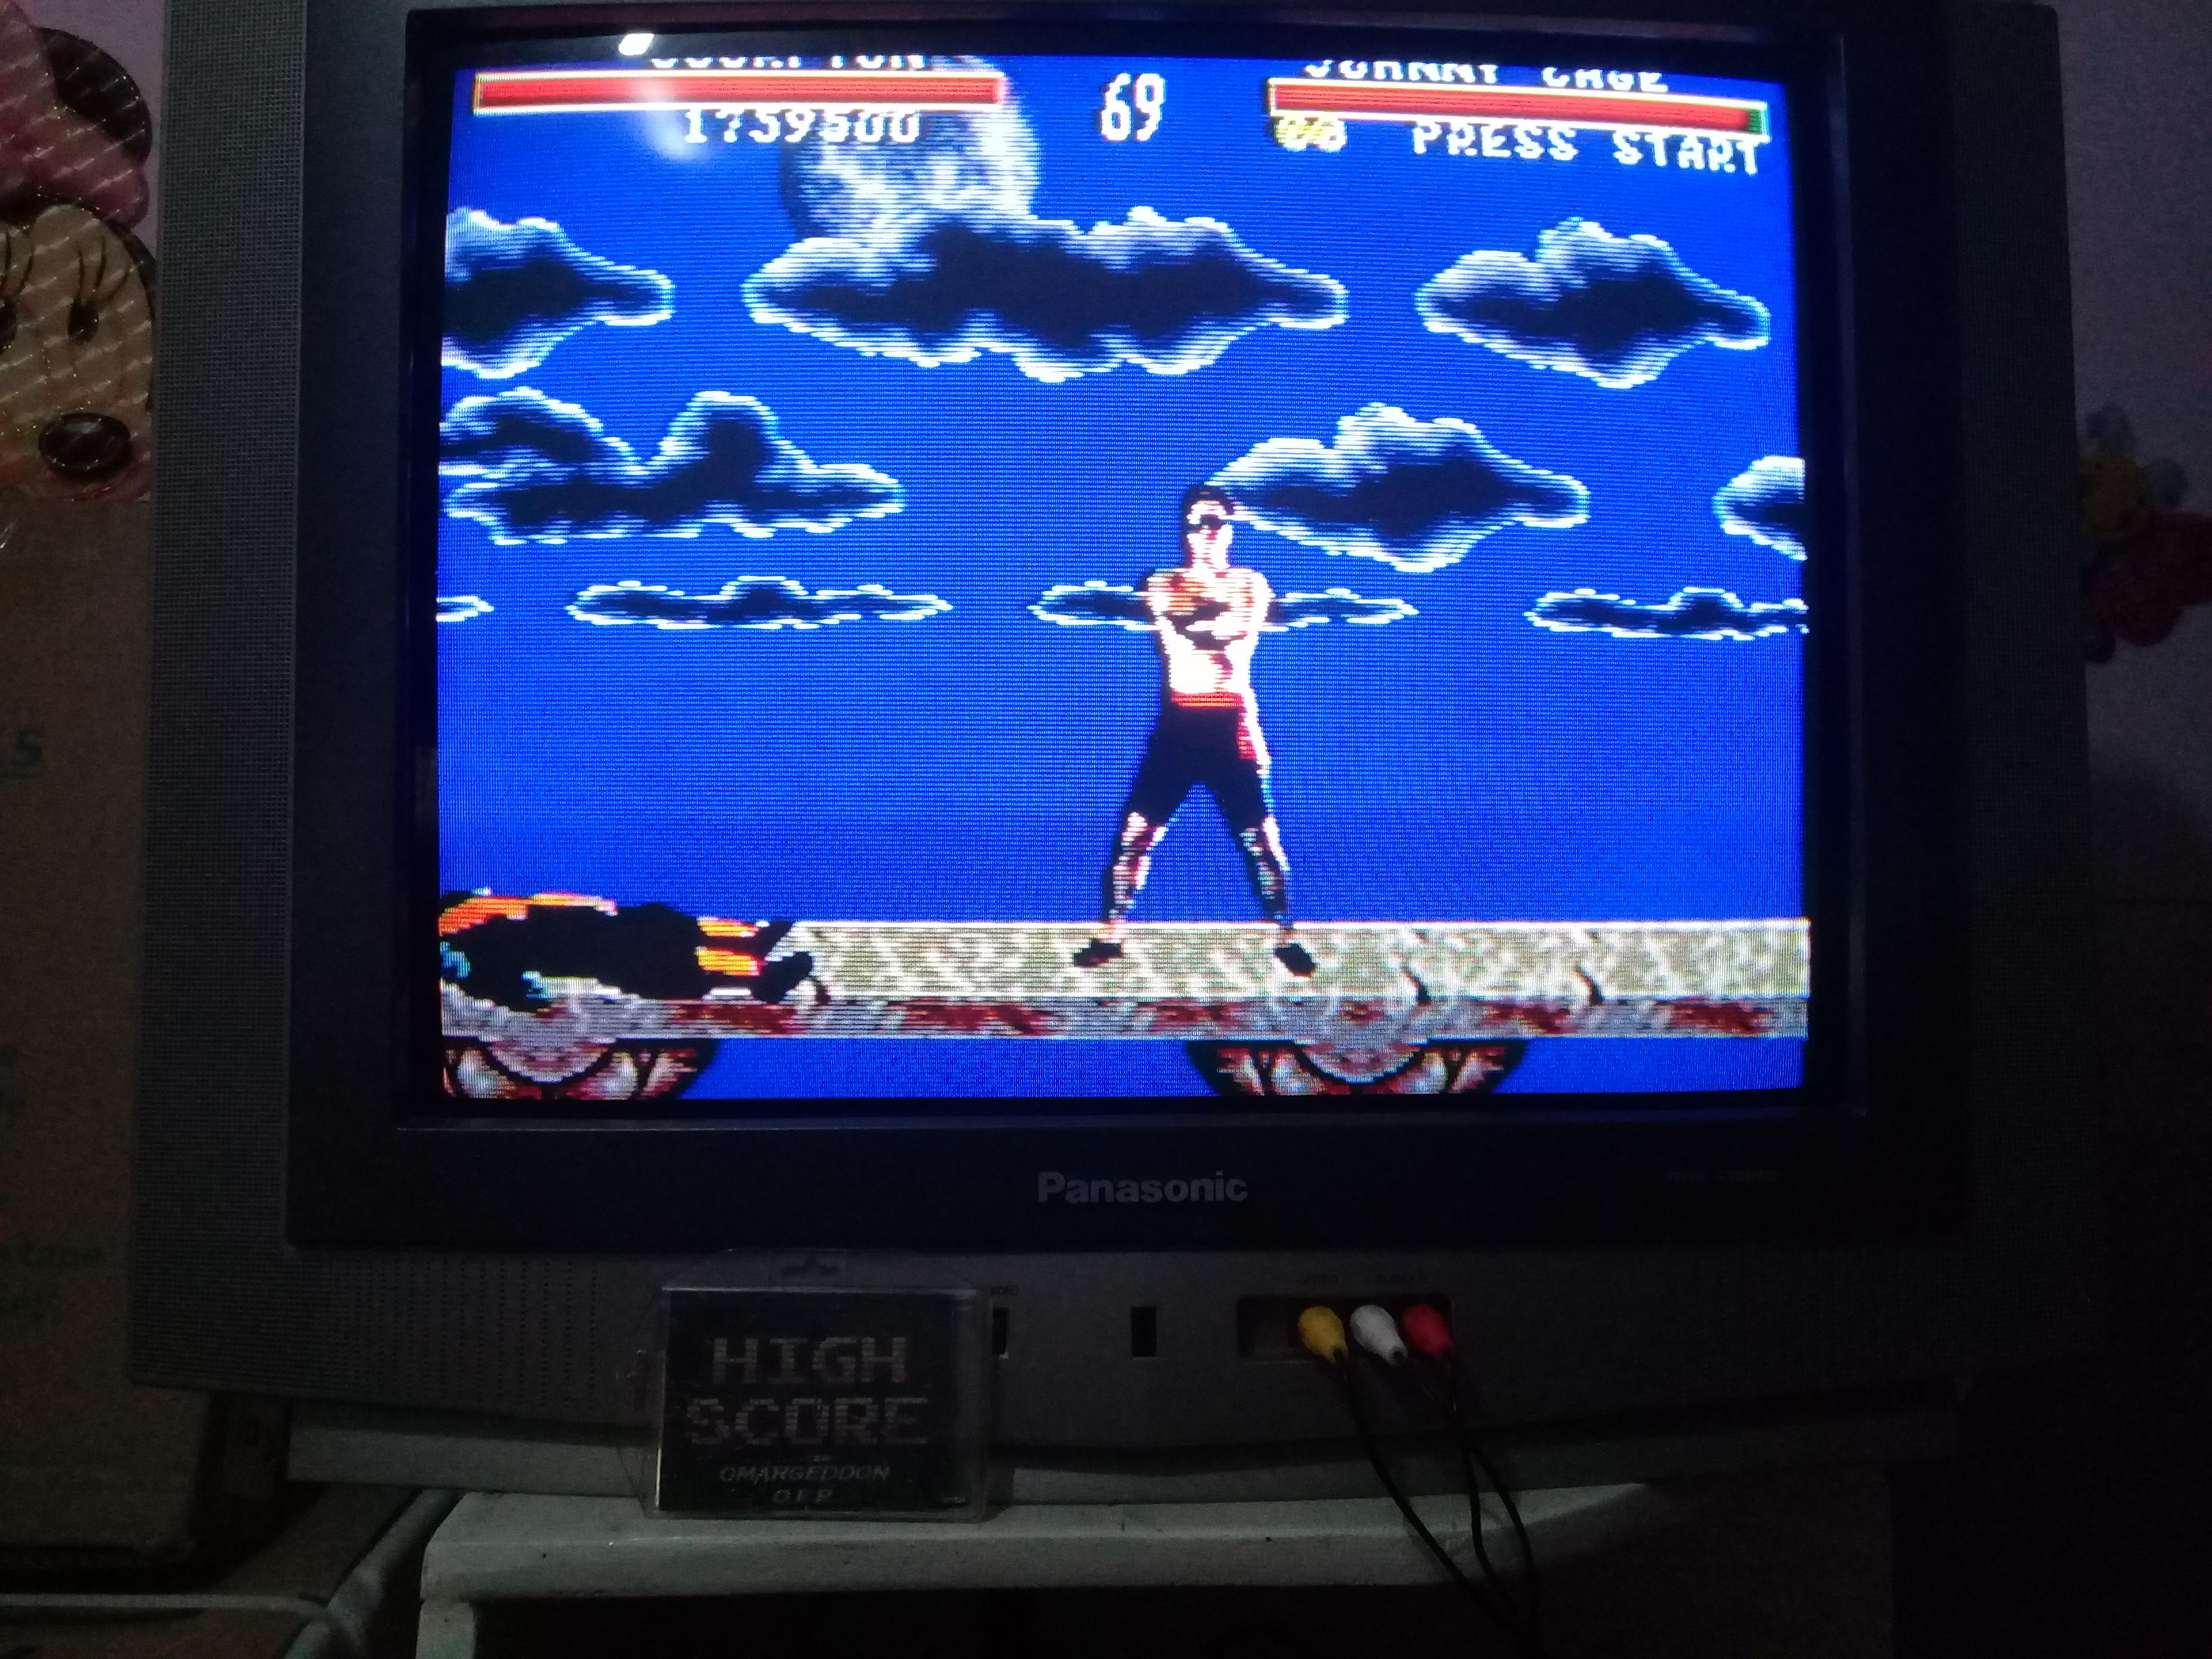 omargeddon: Mortal Kombat [Very Easy] (Sega Genesis / MegaDrive) 1,759,500 points on 2019-03-21 16:17:51